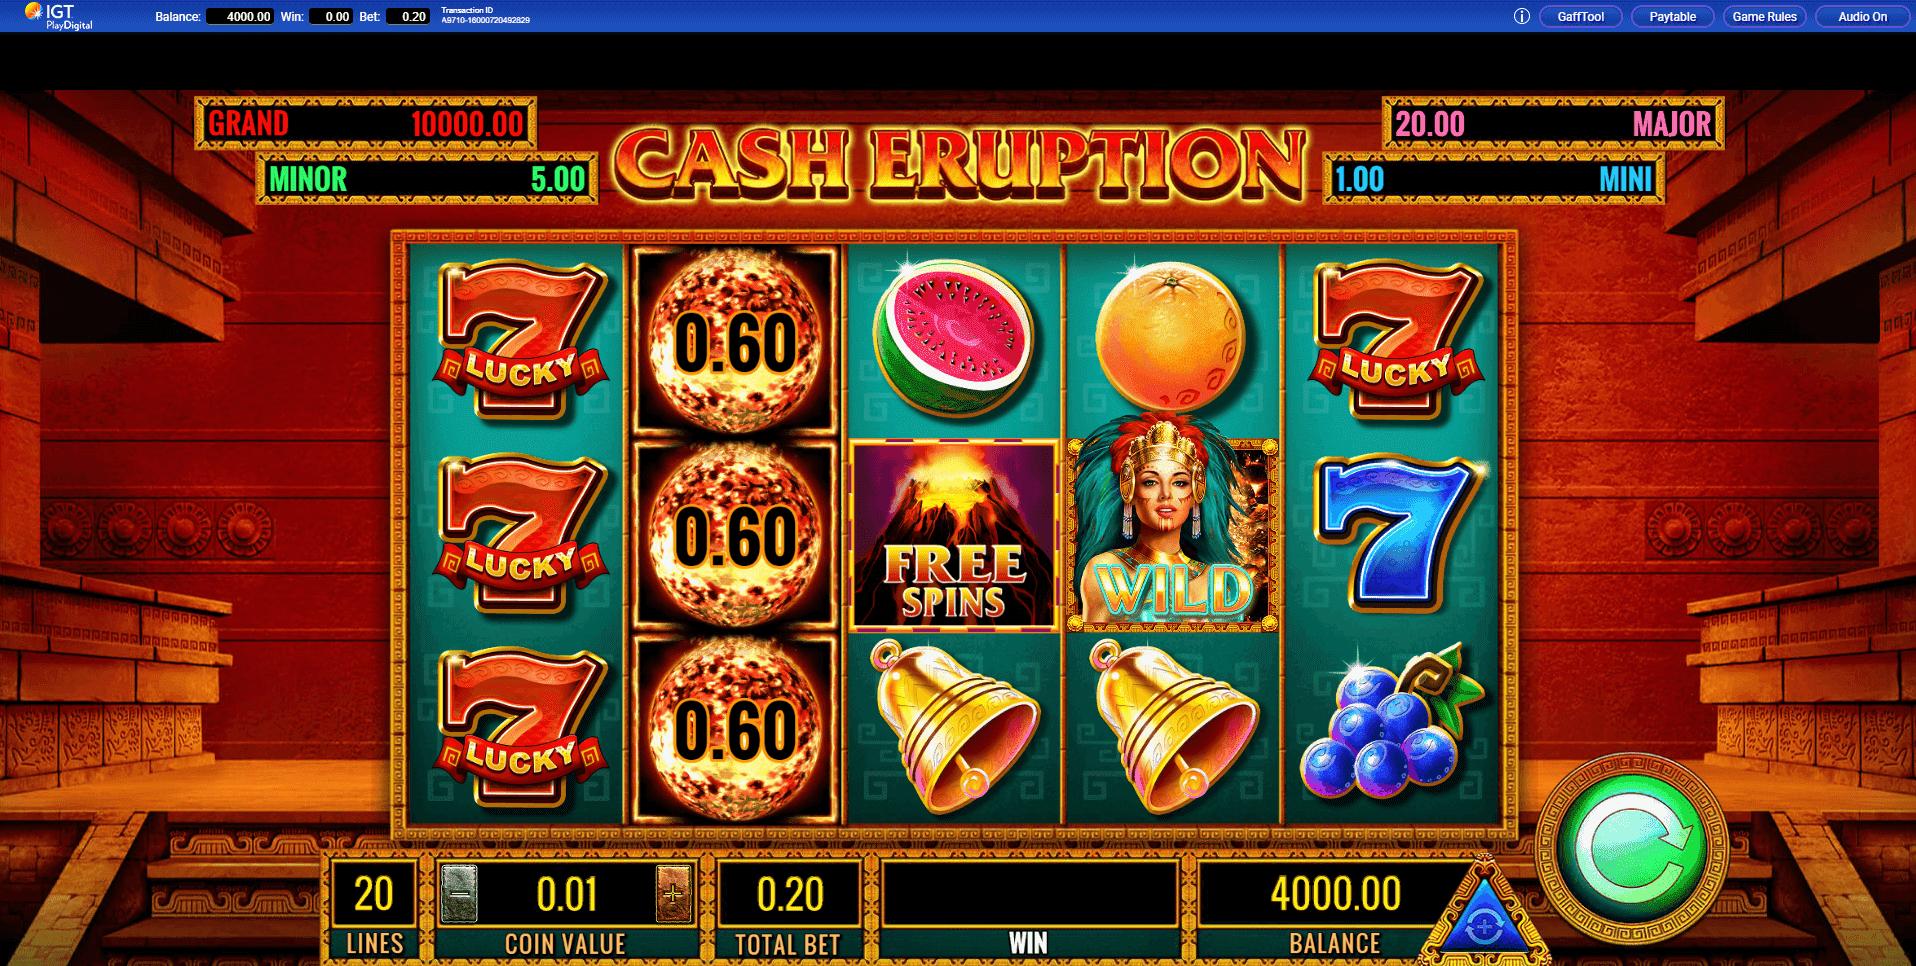 Cash Eruption slot machine screenshot